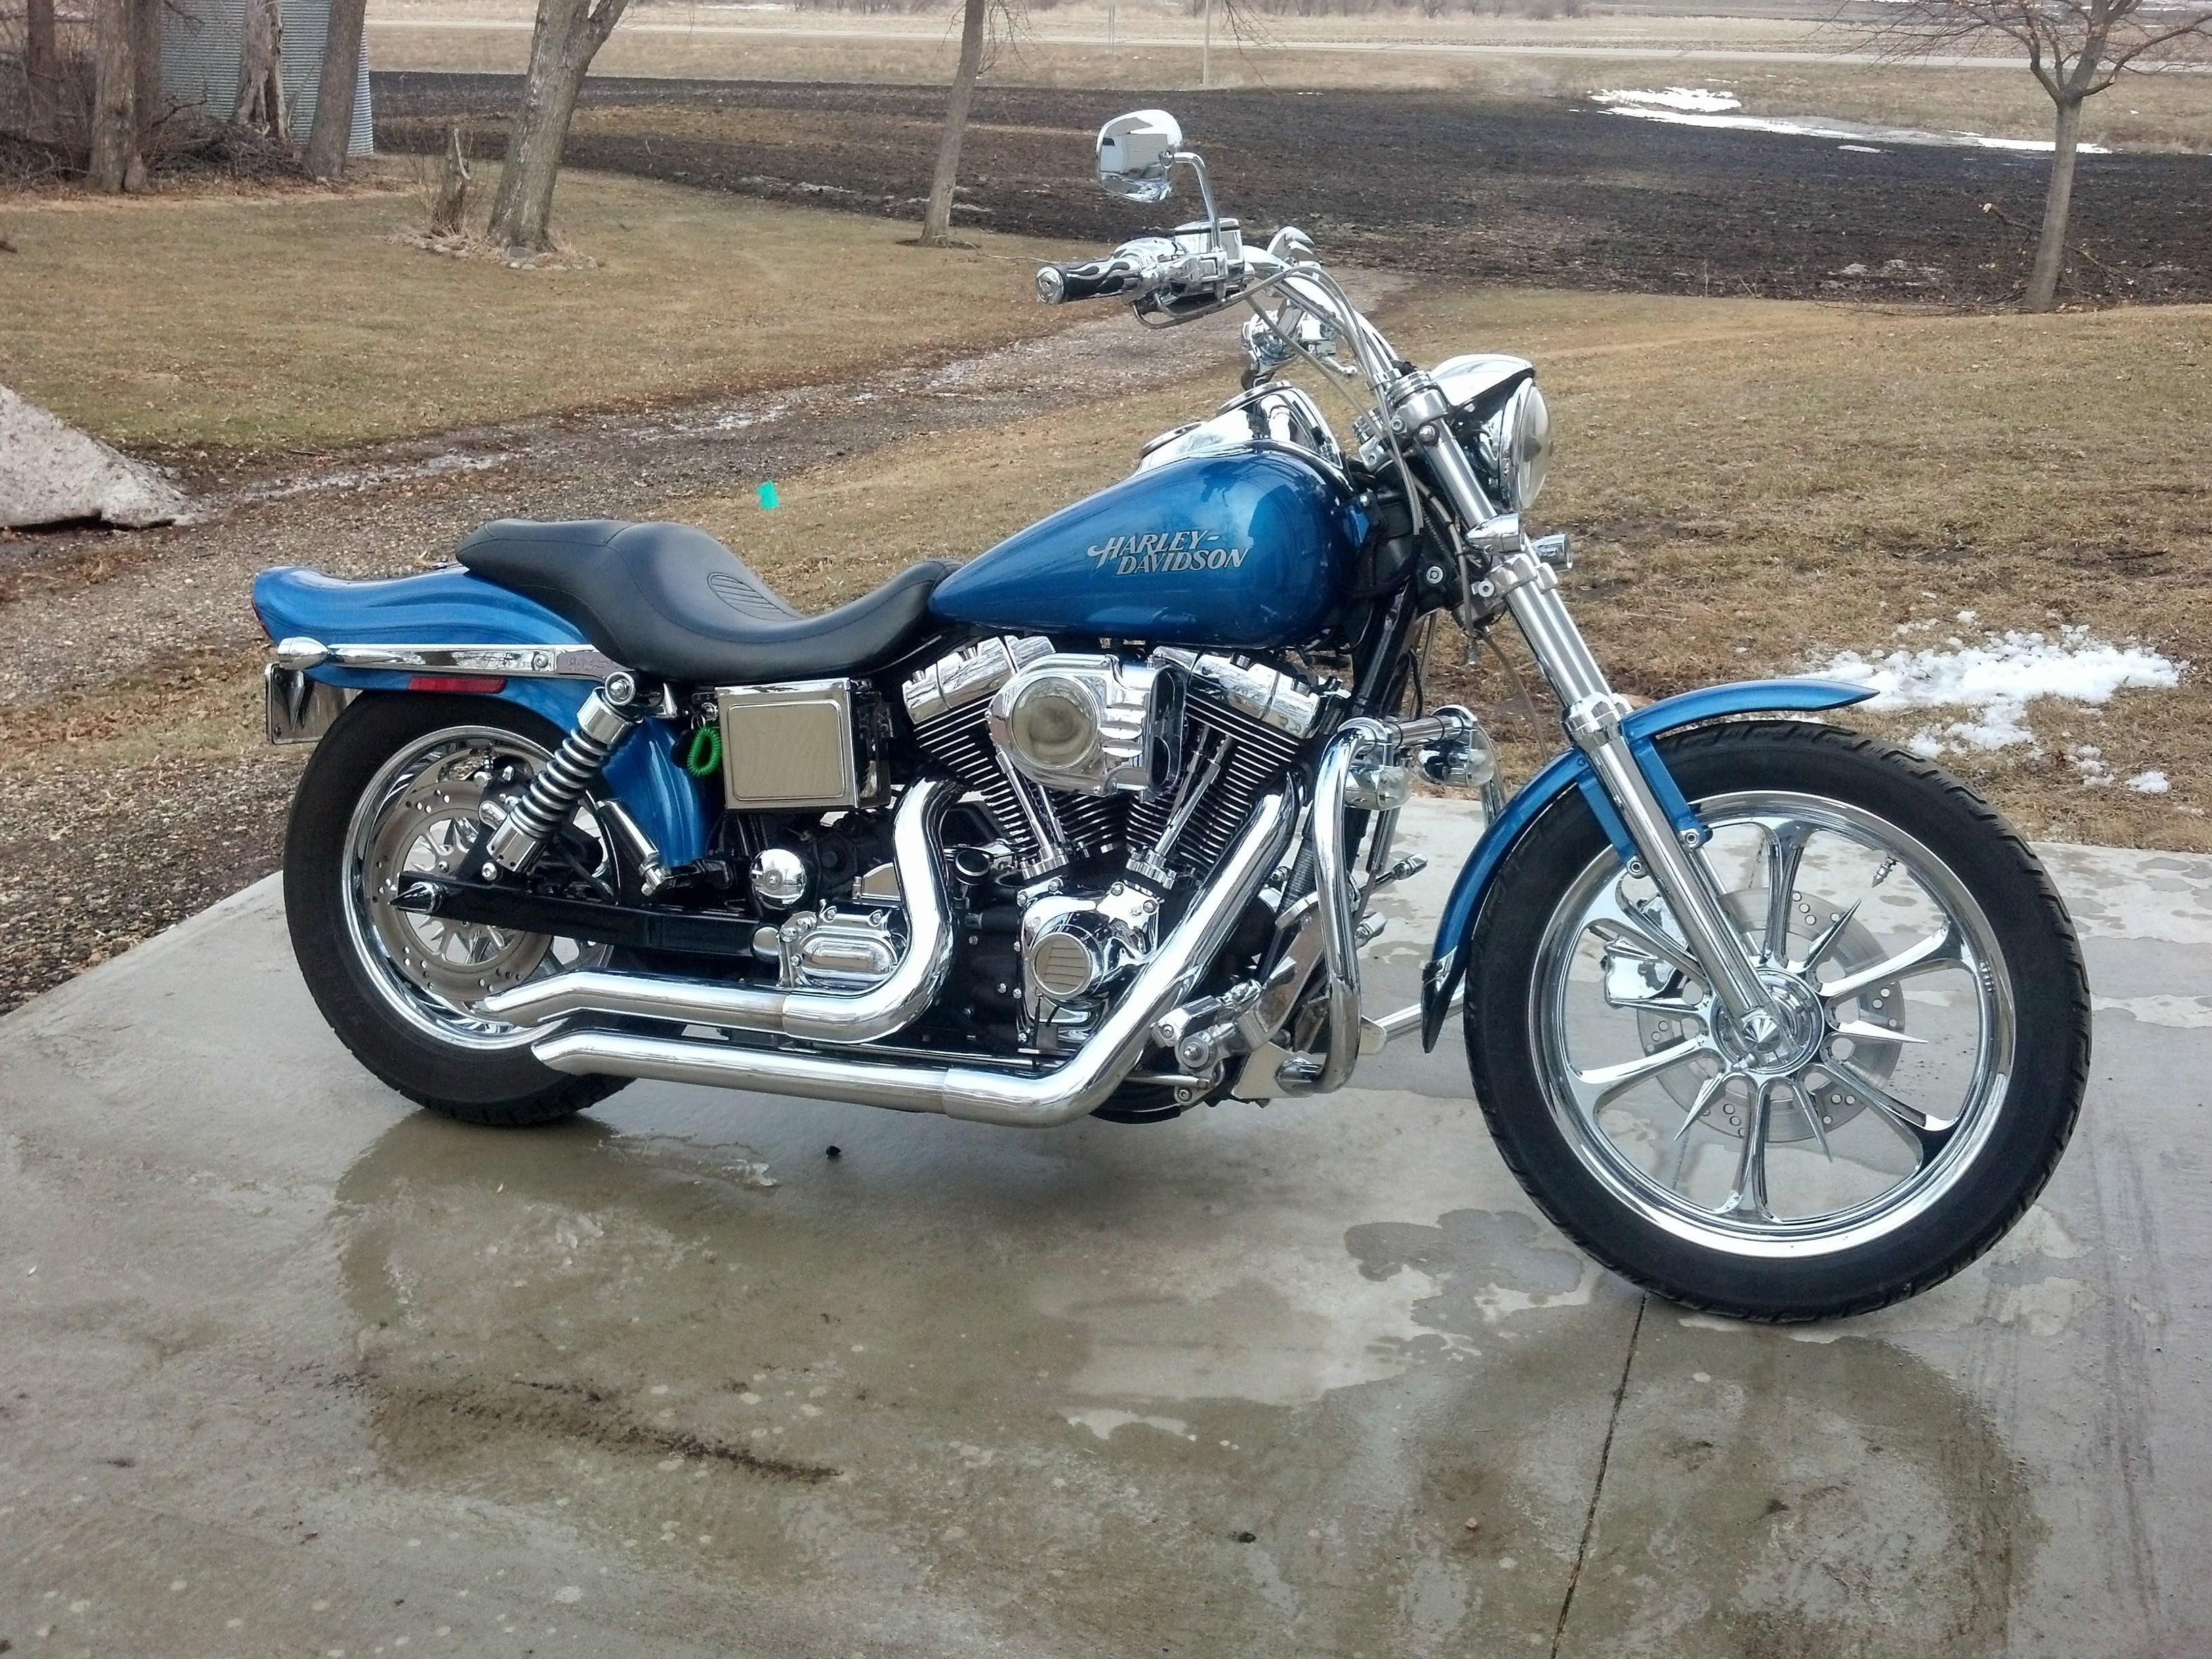 2005 Harley-Davidson® FXDL/I Dyna® Low Rider (Chopper Blue